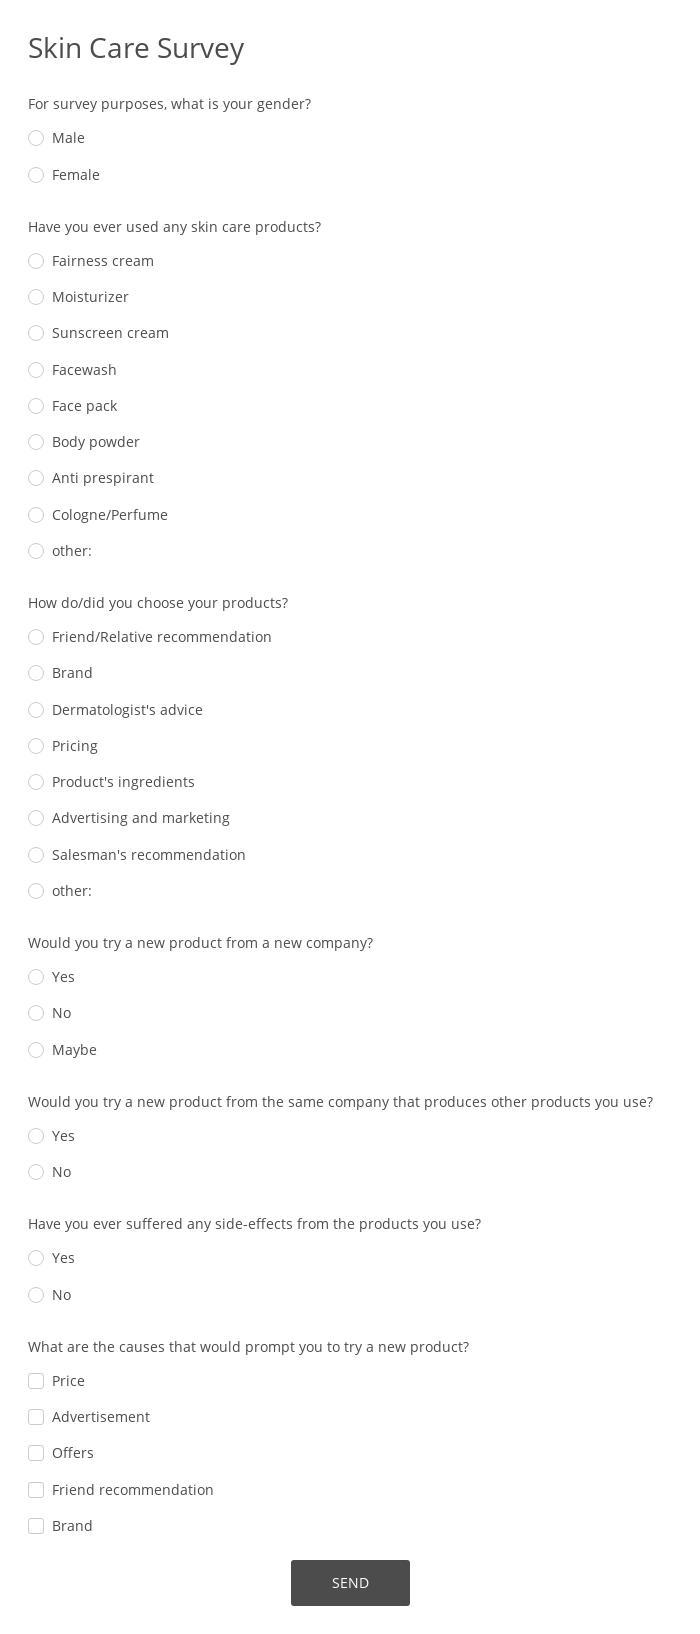 Skin Care Survey